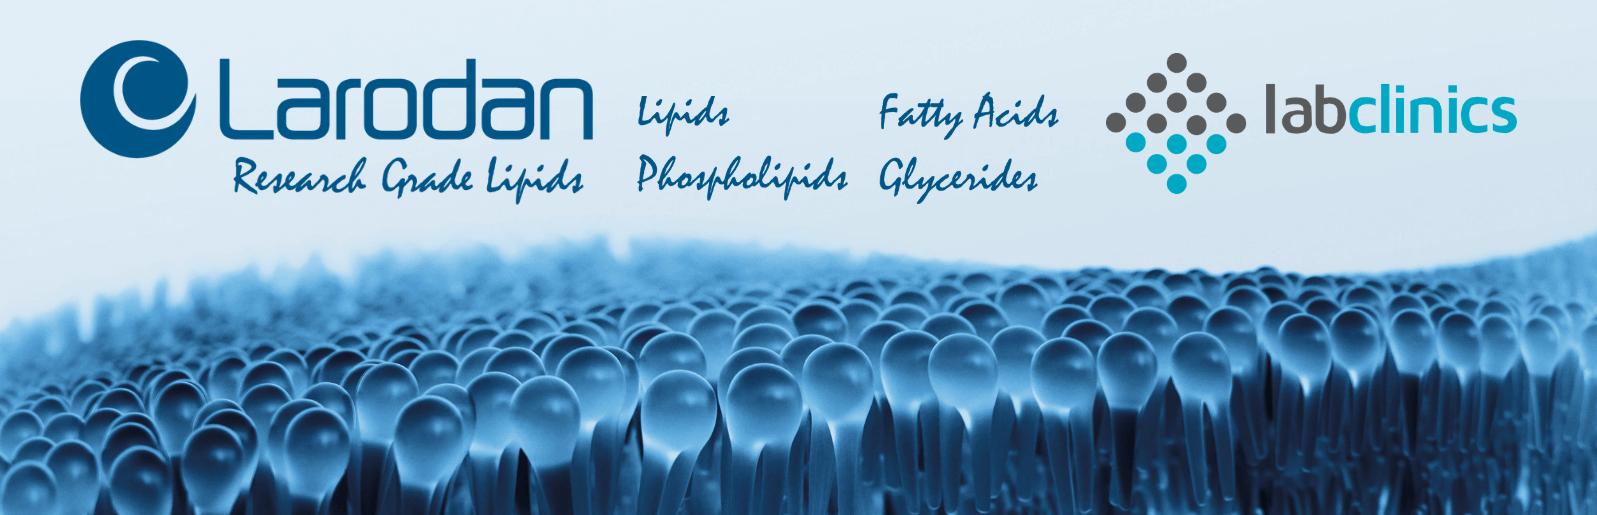 Larodan, lipids, phospholipids, fatty acids, glycerides, Spain, Portugal, lípidos, fosfolípidos, ácidos grasos, glicéridos